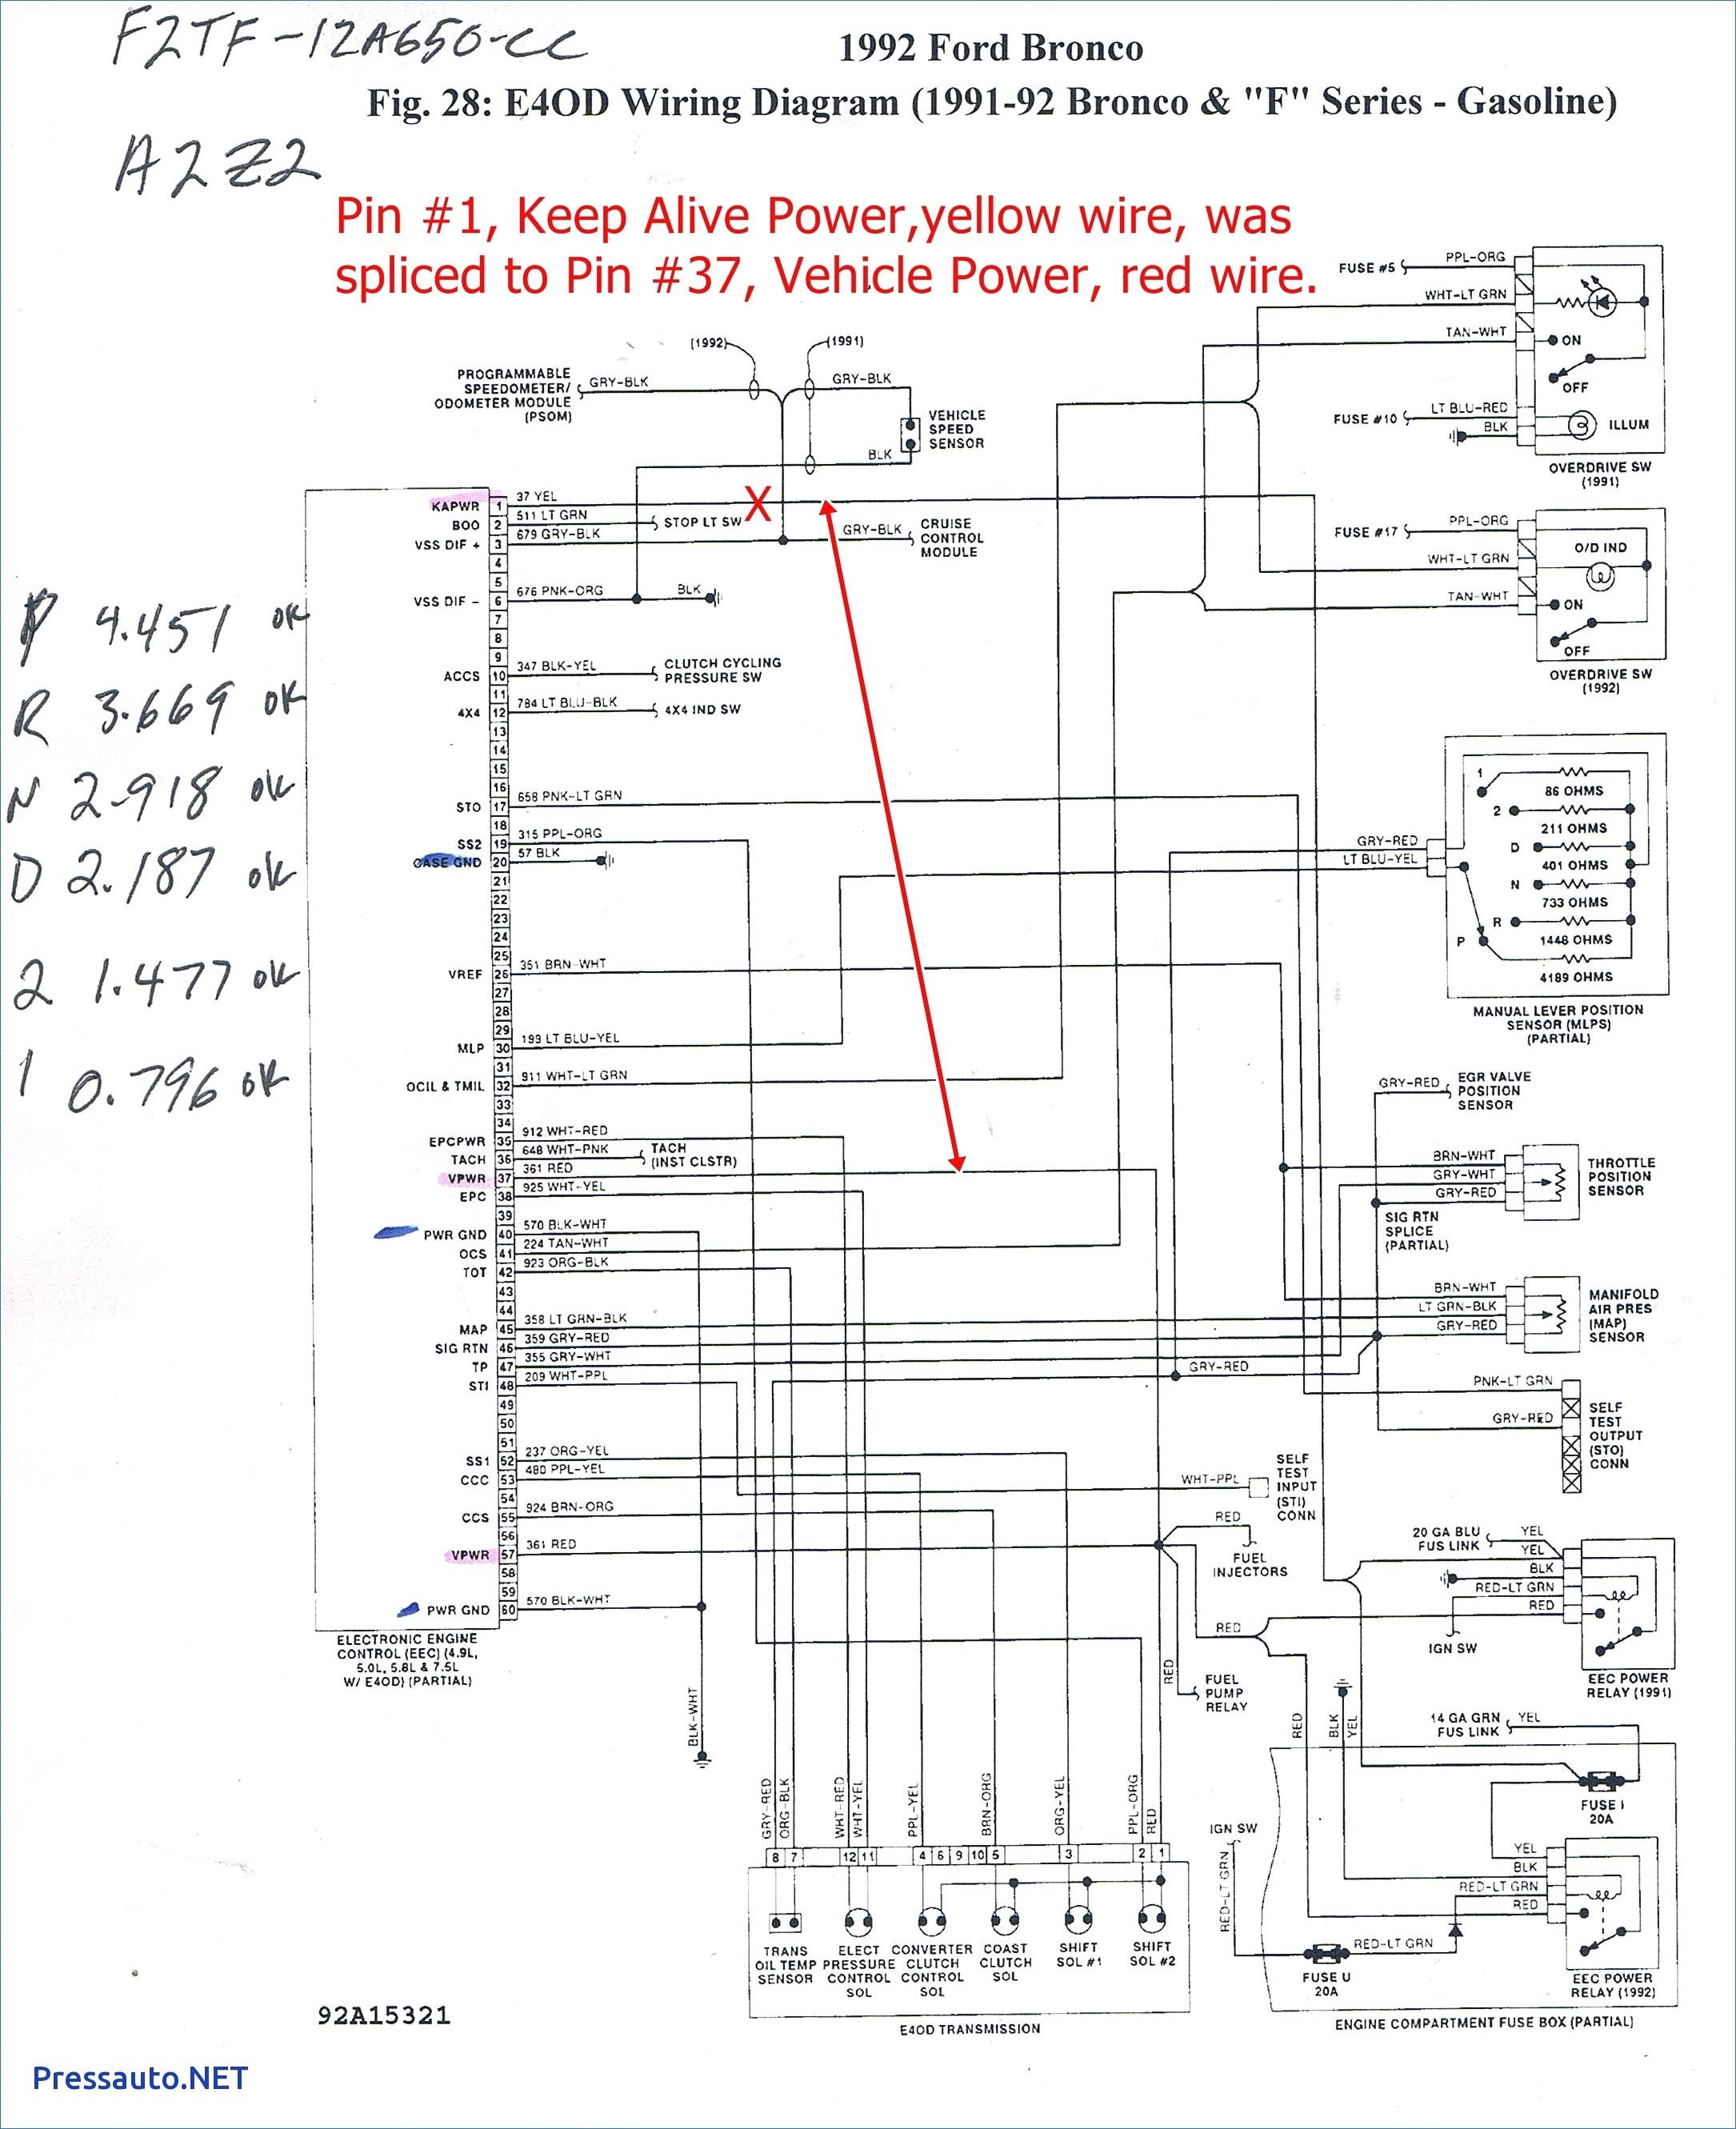 2001 ford Taurus Engine Diagram Mercury Sable Wiring Diagram Headlight Spark Plug 2002 Power Window Of 2001 ford Taurus Engine Diagram